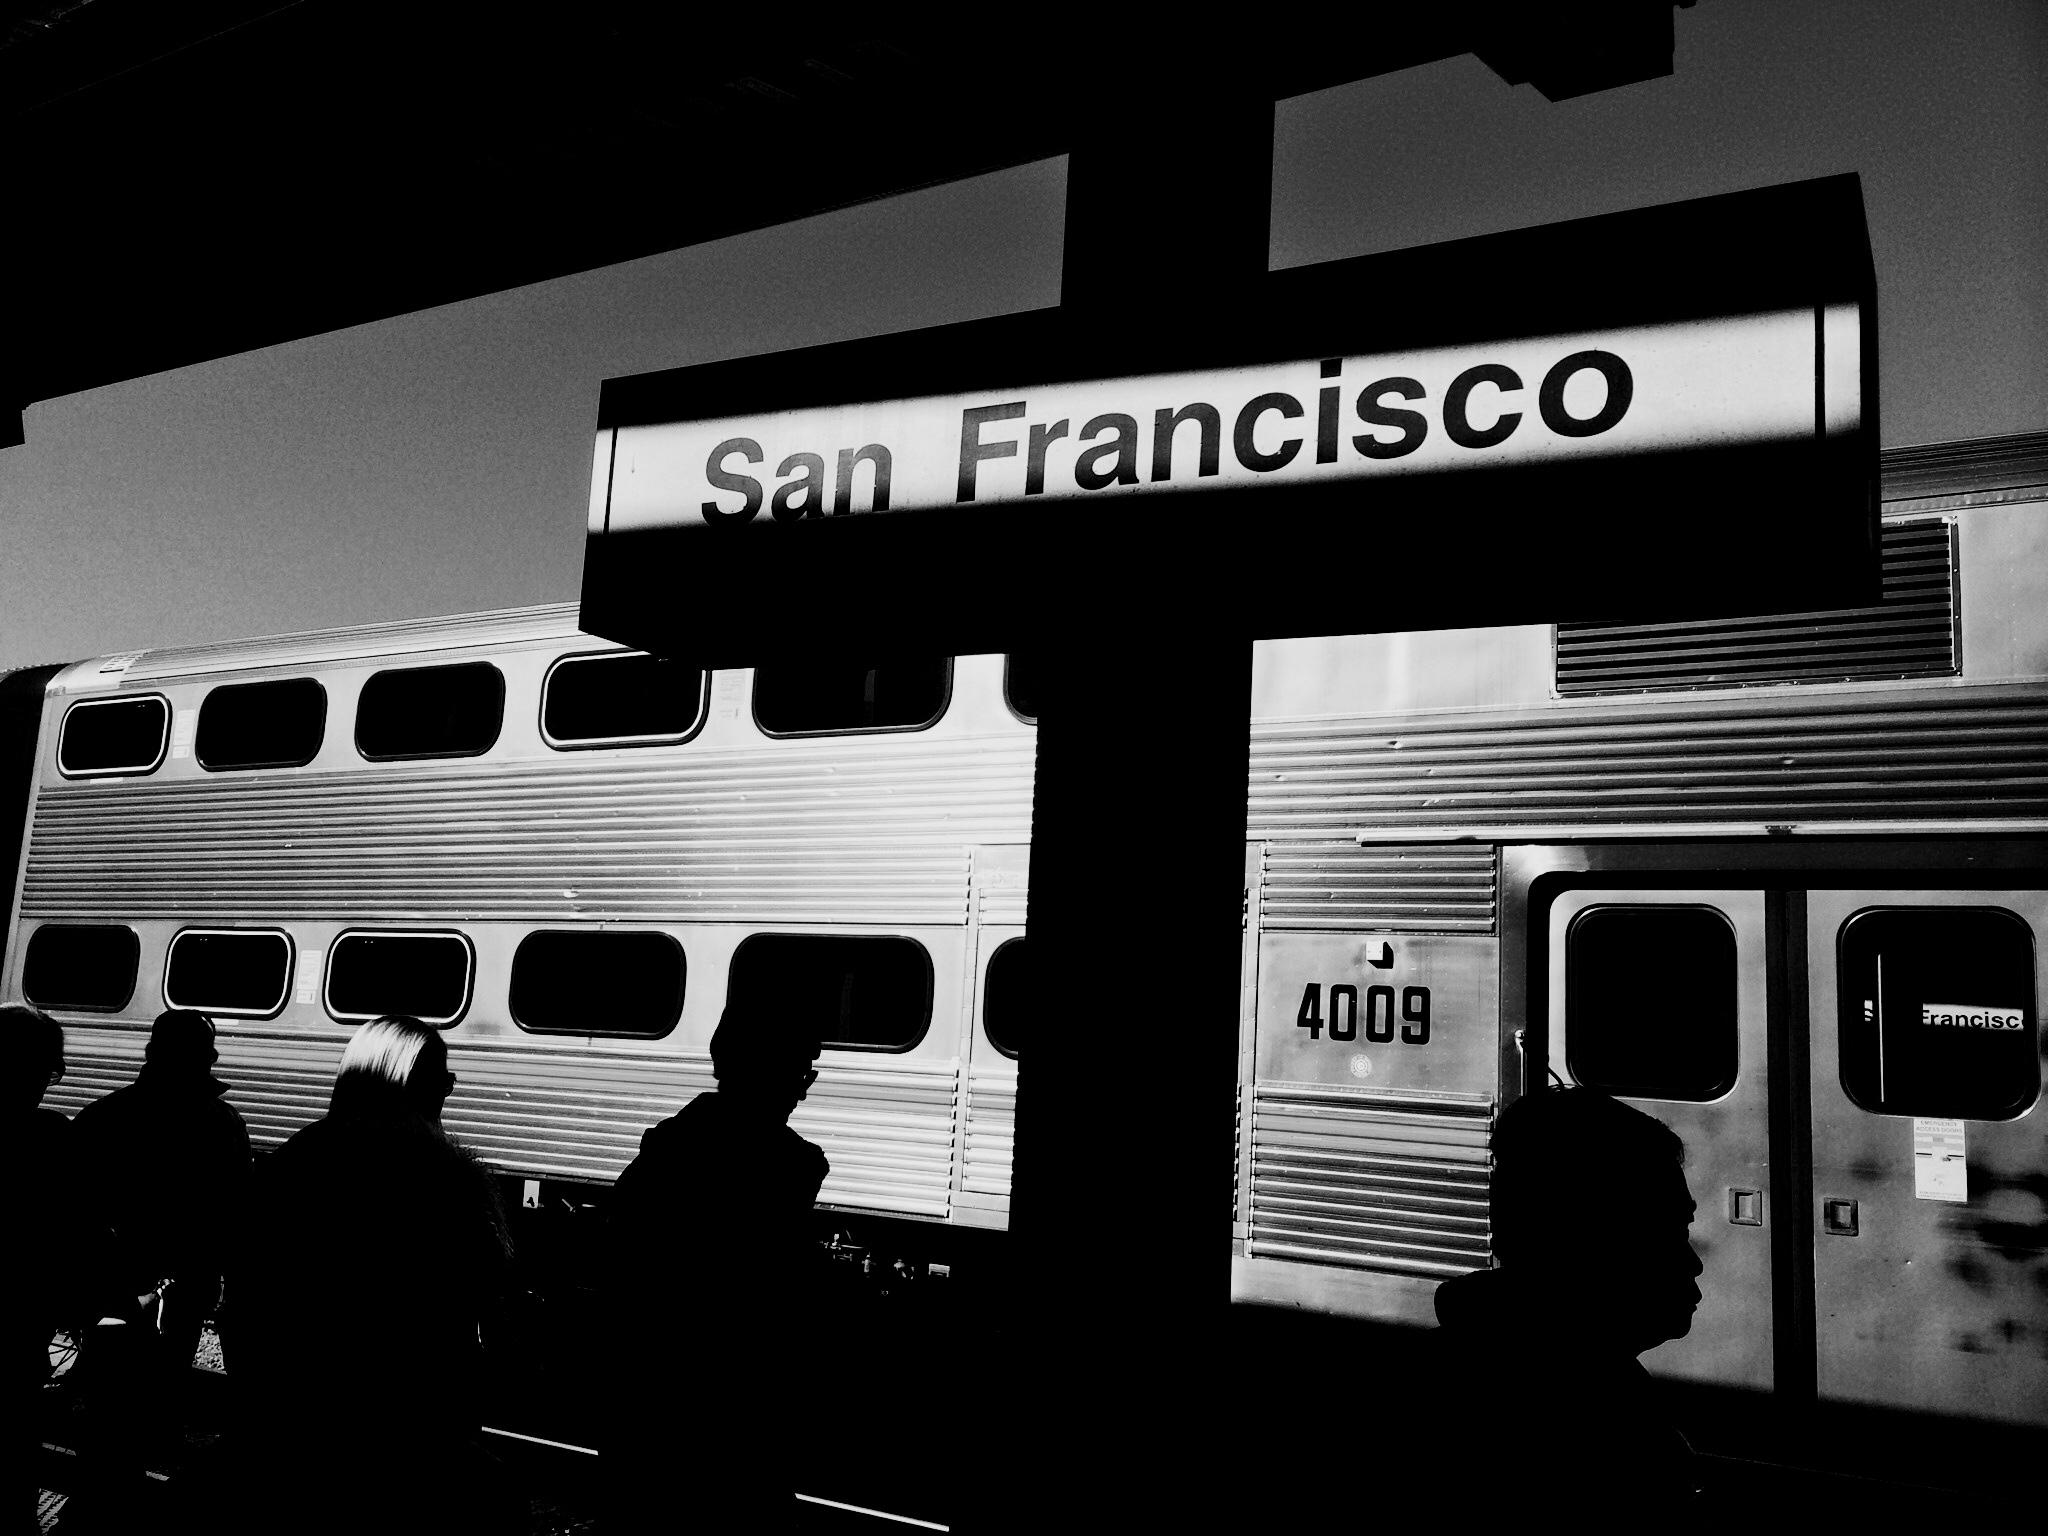 All Aboard San Francisco